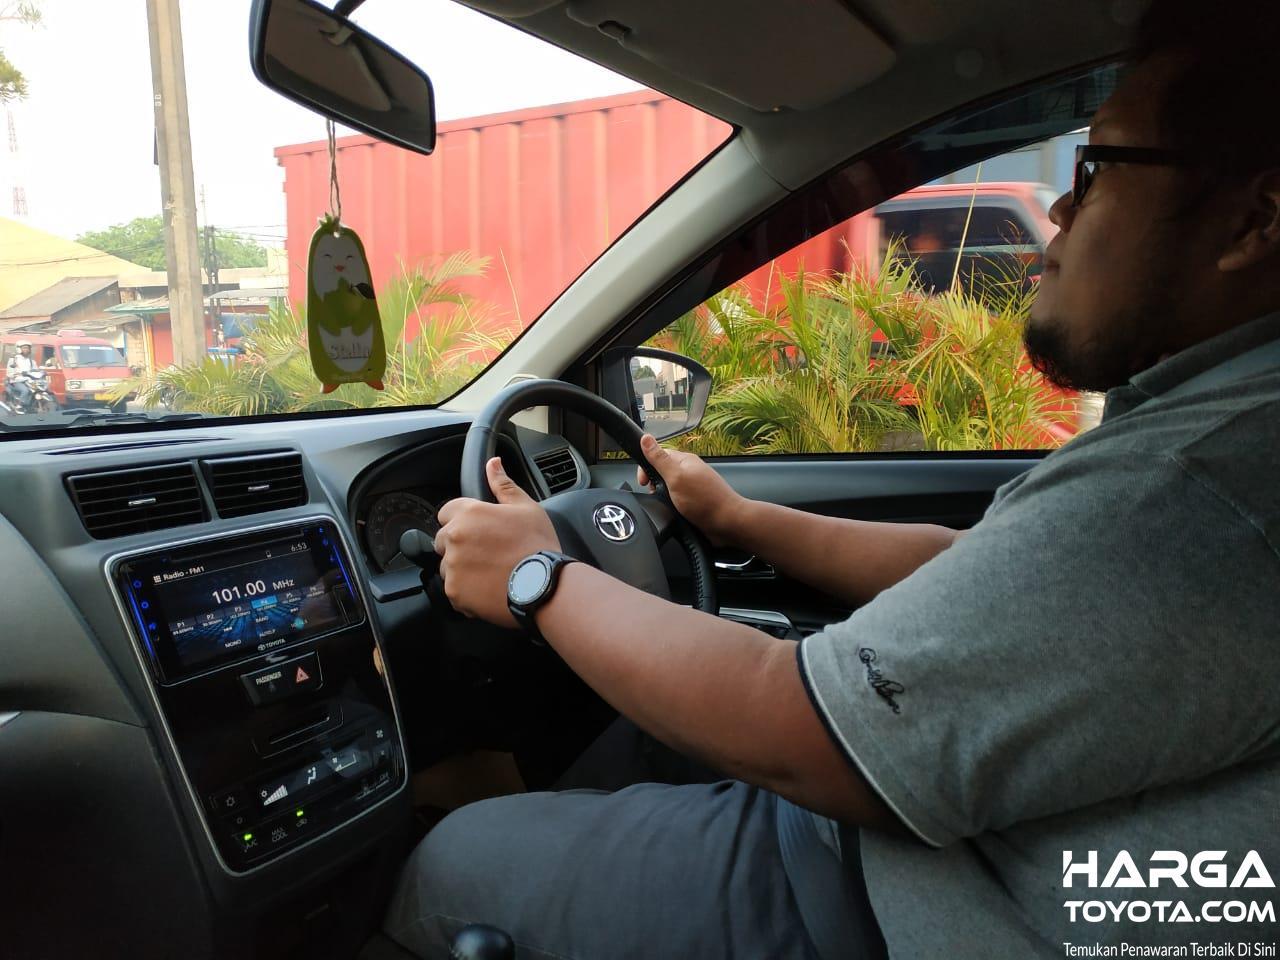 Gambar menunjukkan tim tester Hargatoyota mengemudikan Toyota Avanza Veloz